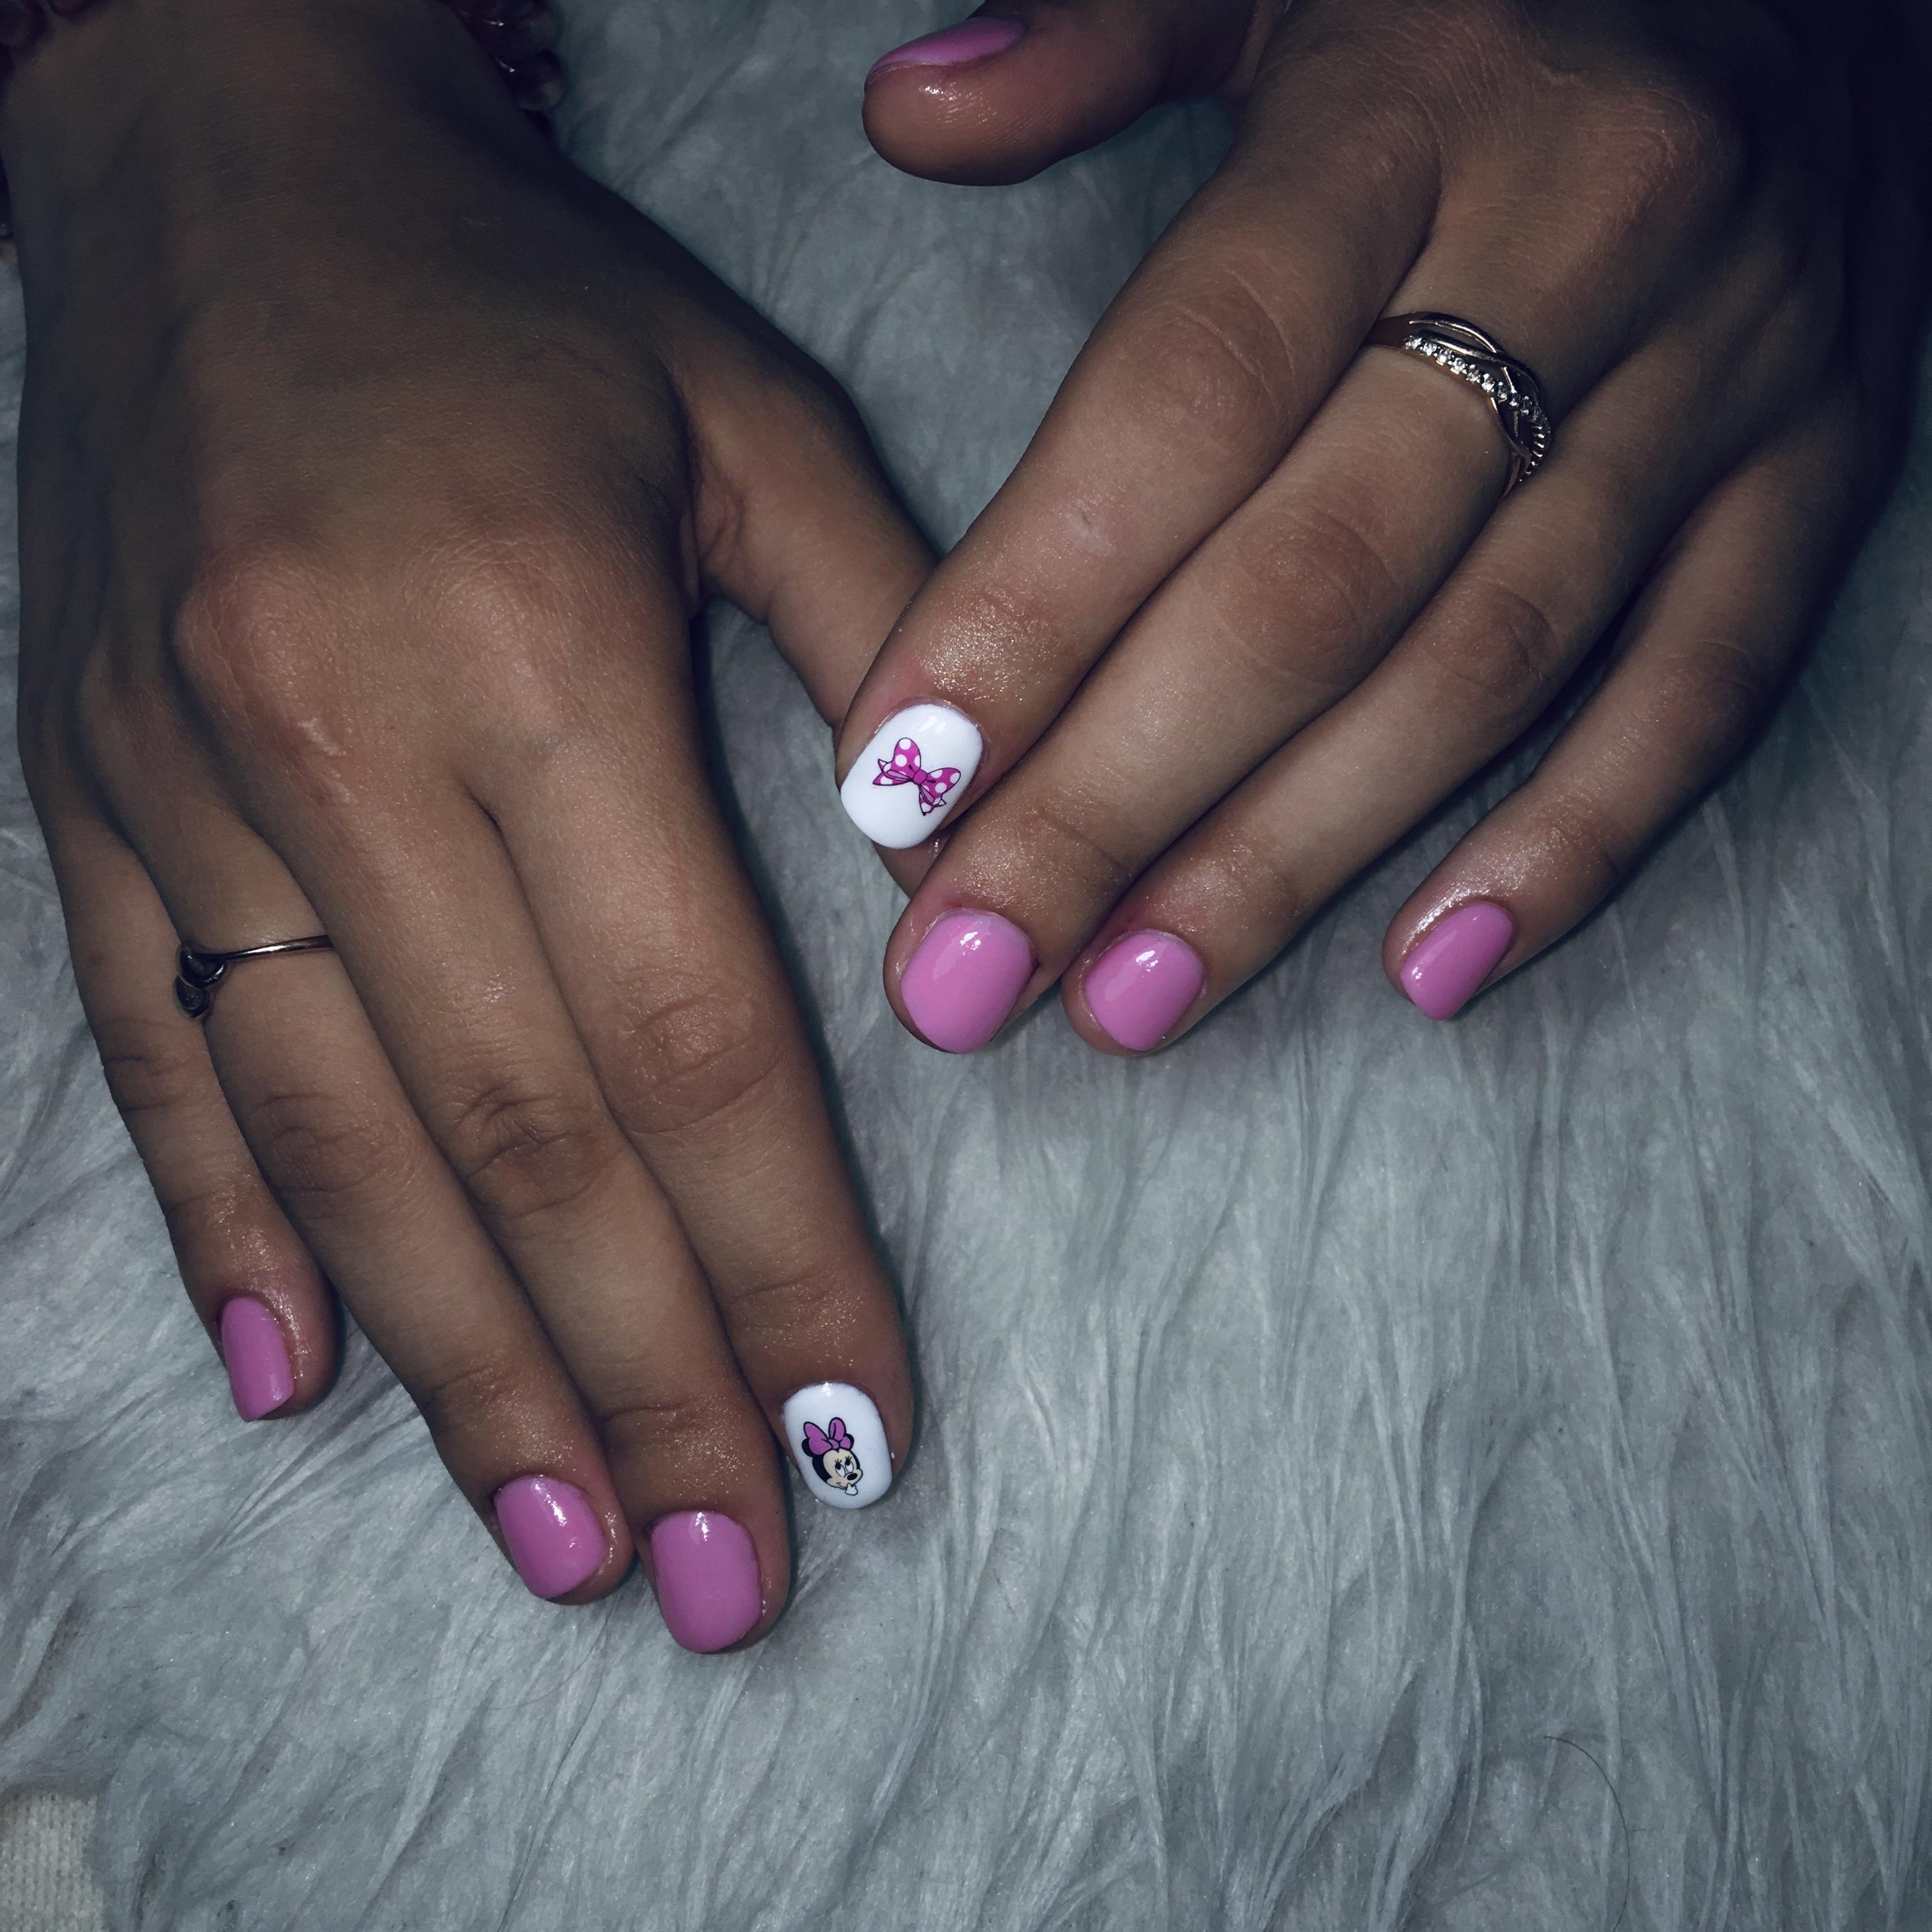 Маникюр с Минни Маус в лиловом цвете на короткие ногти.